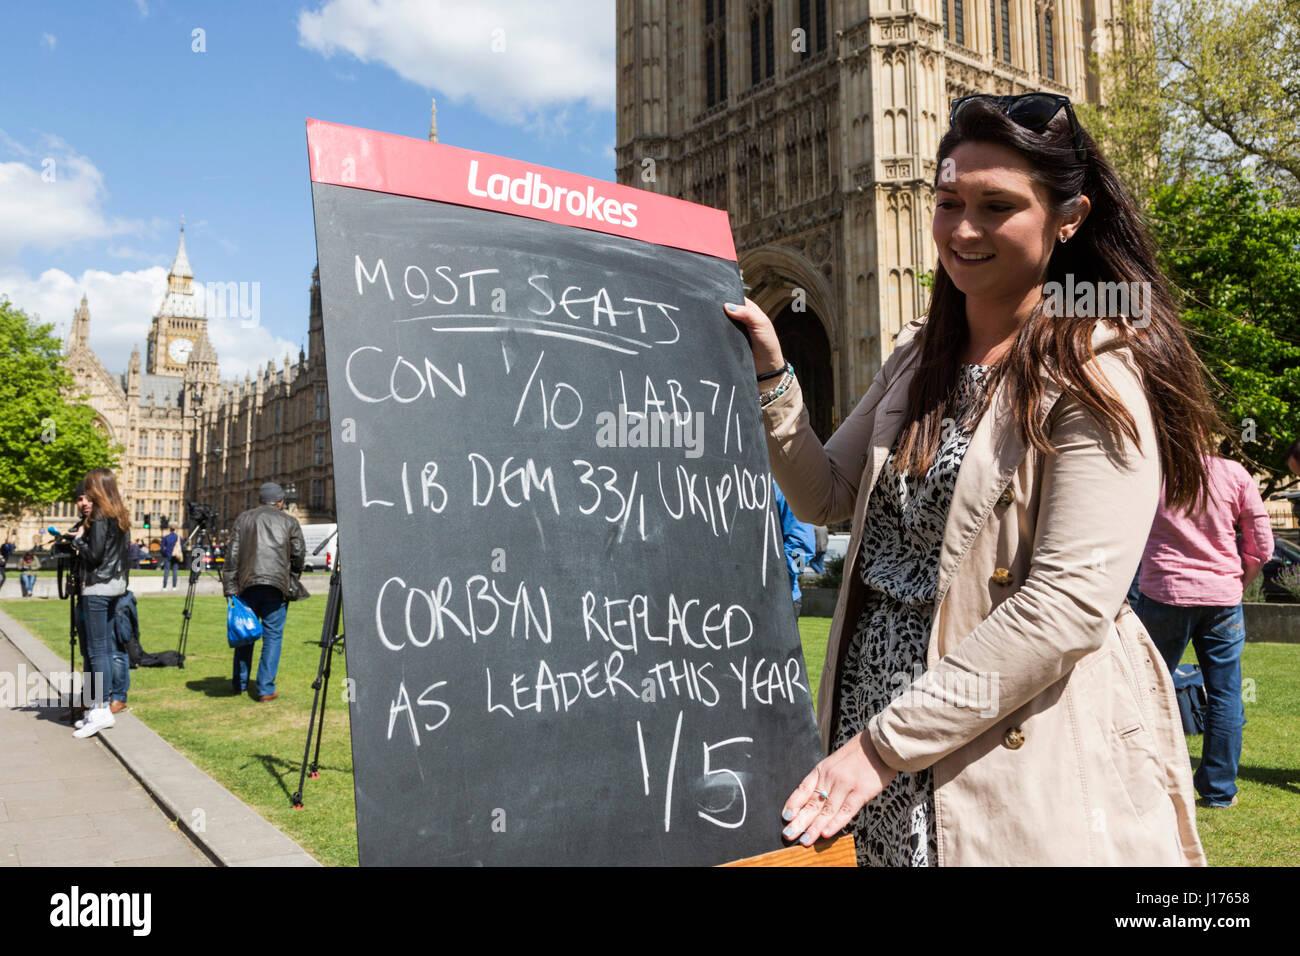 Jessica bridges ladbrokes betting alabama tennessee betting line 2021 calendar